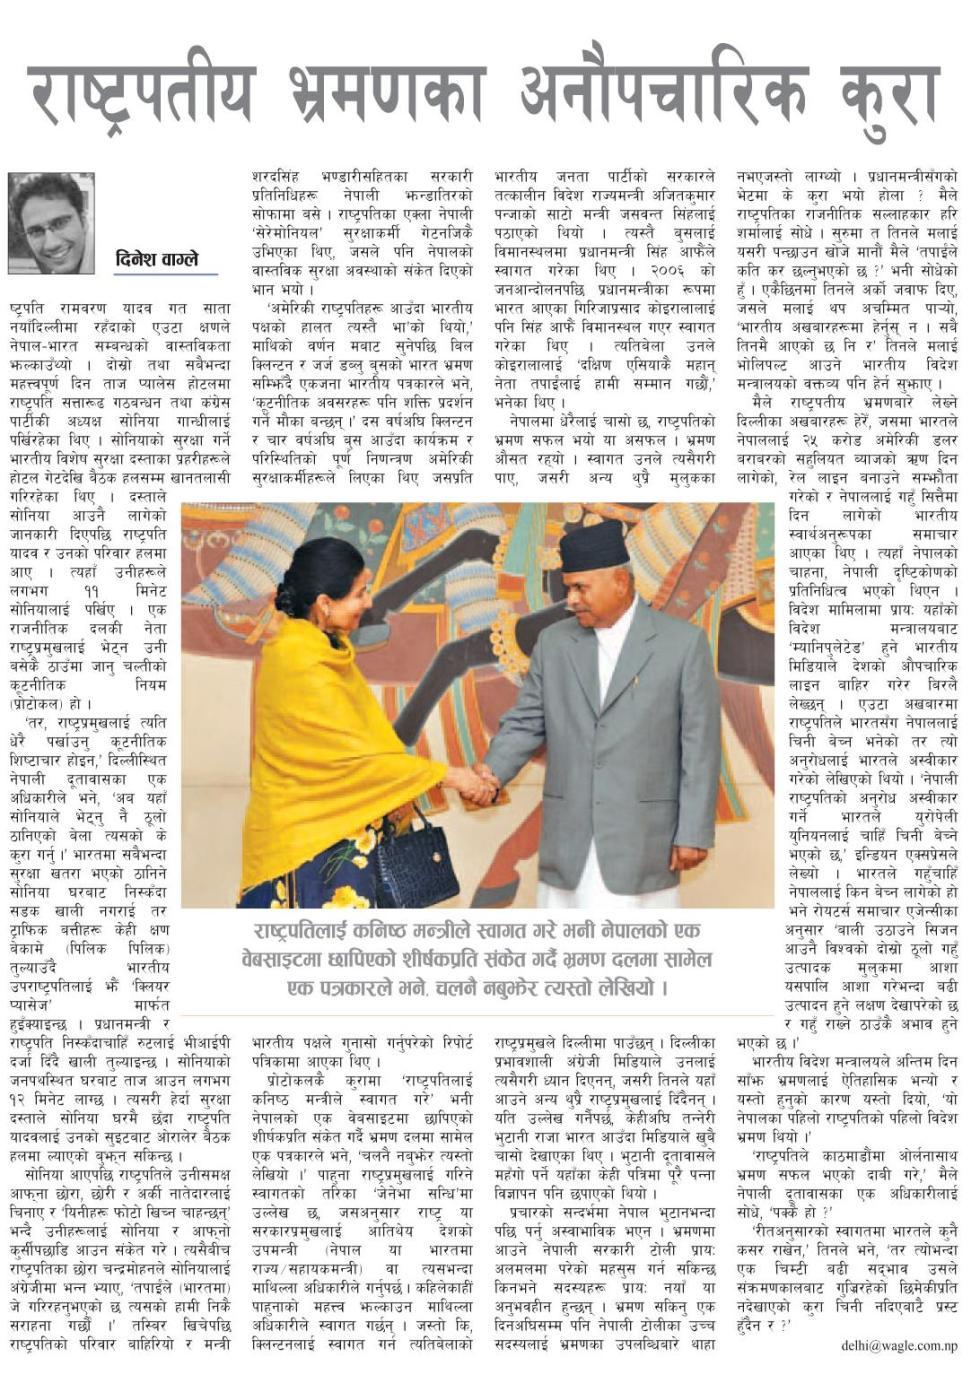 Presidential trip. Informal observation. kantipur page 7